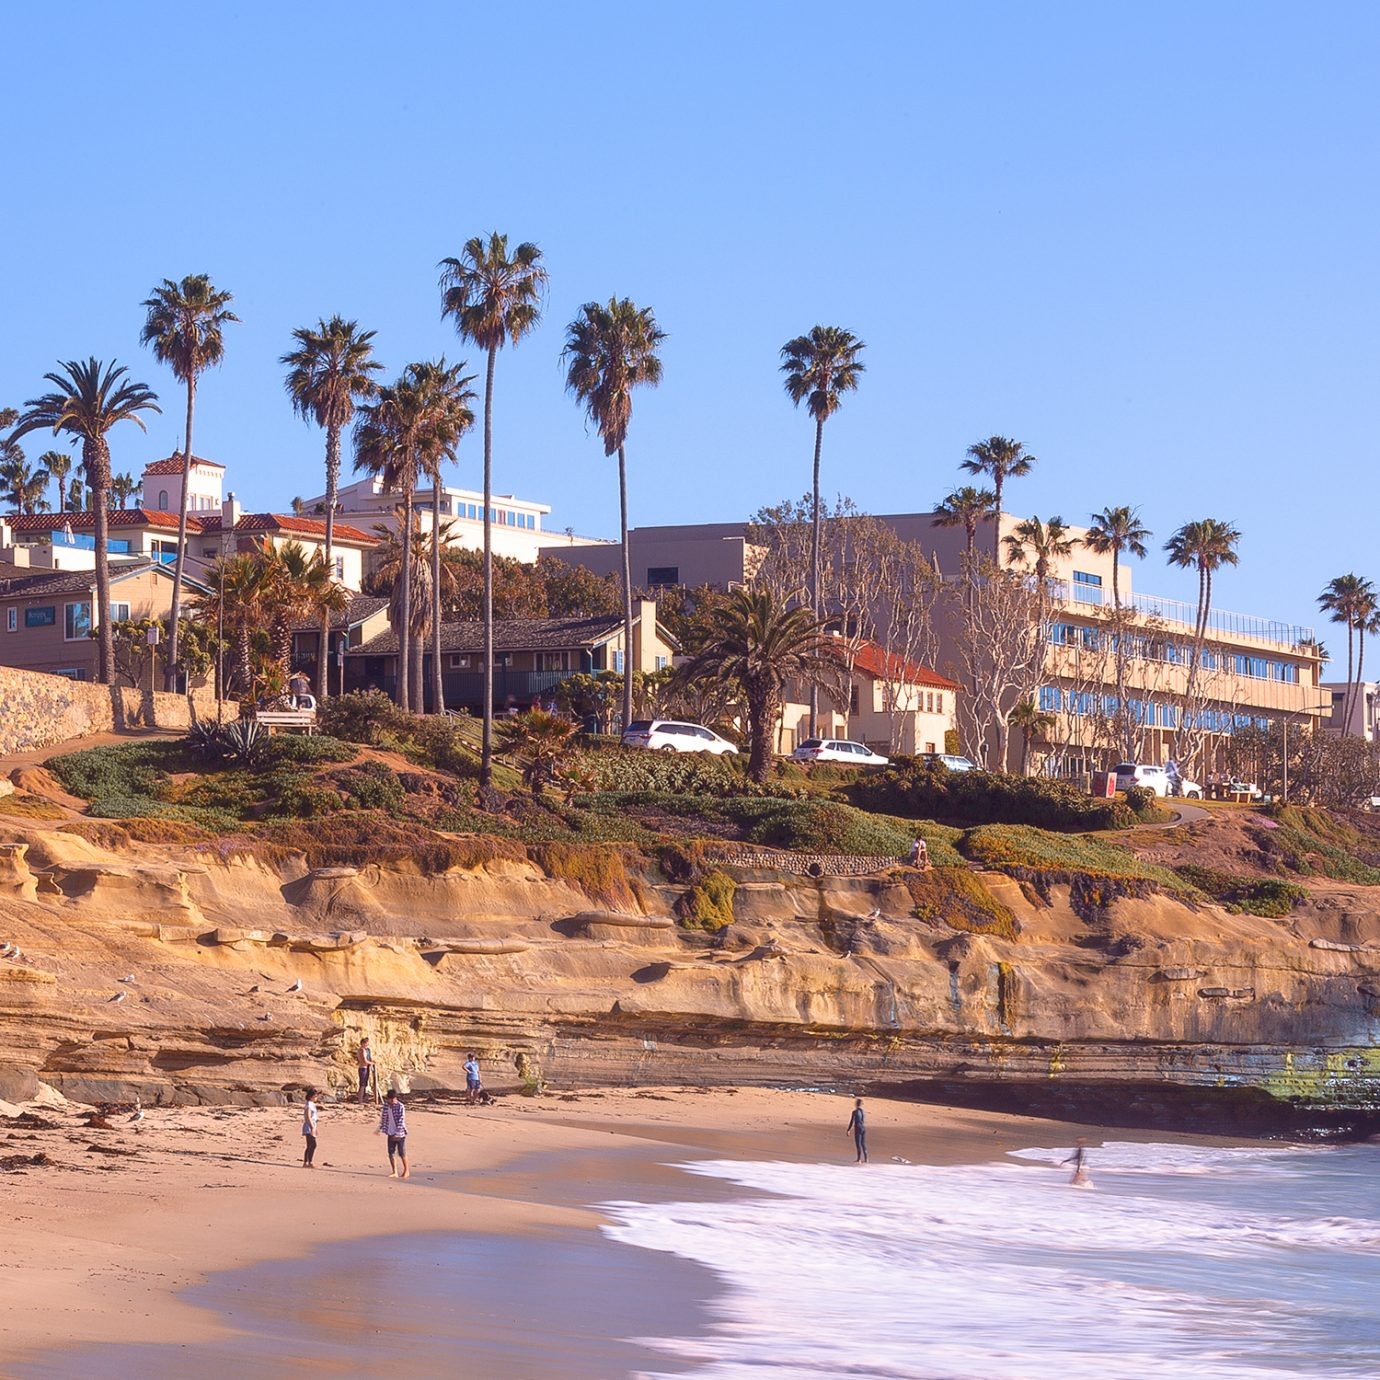 Sunset Cliffs Shoreline in Sunny San Diego, California USA